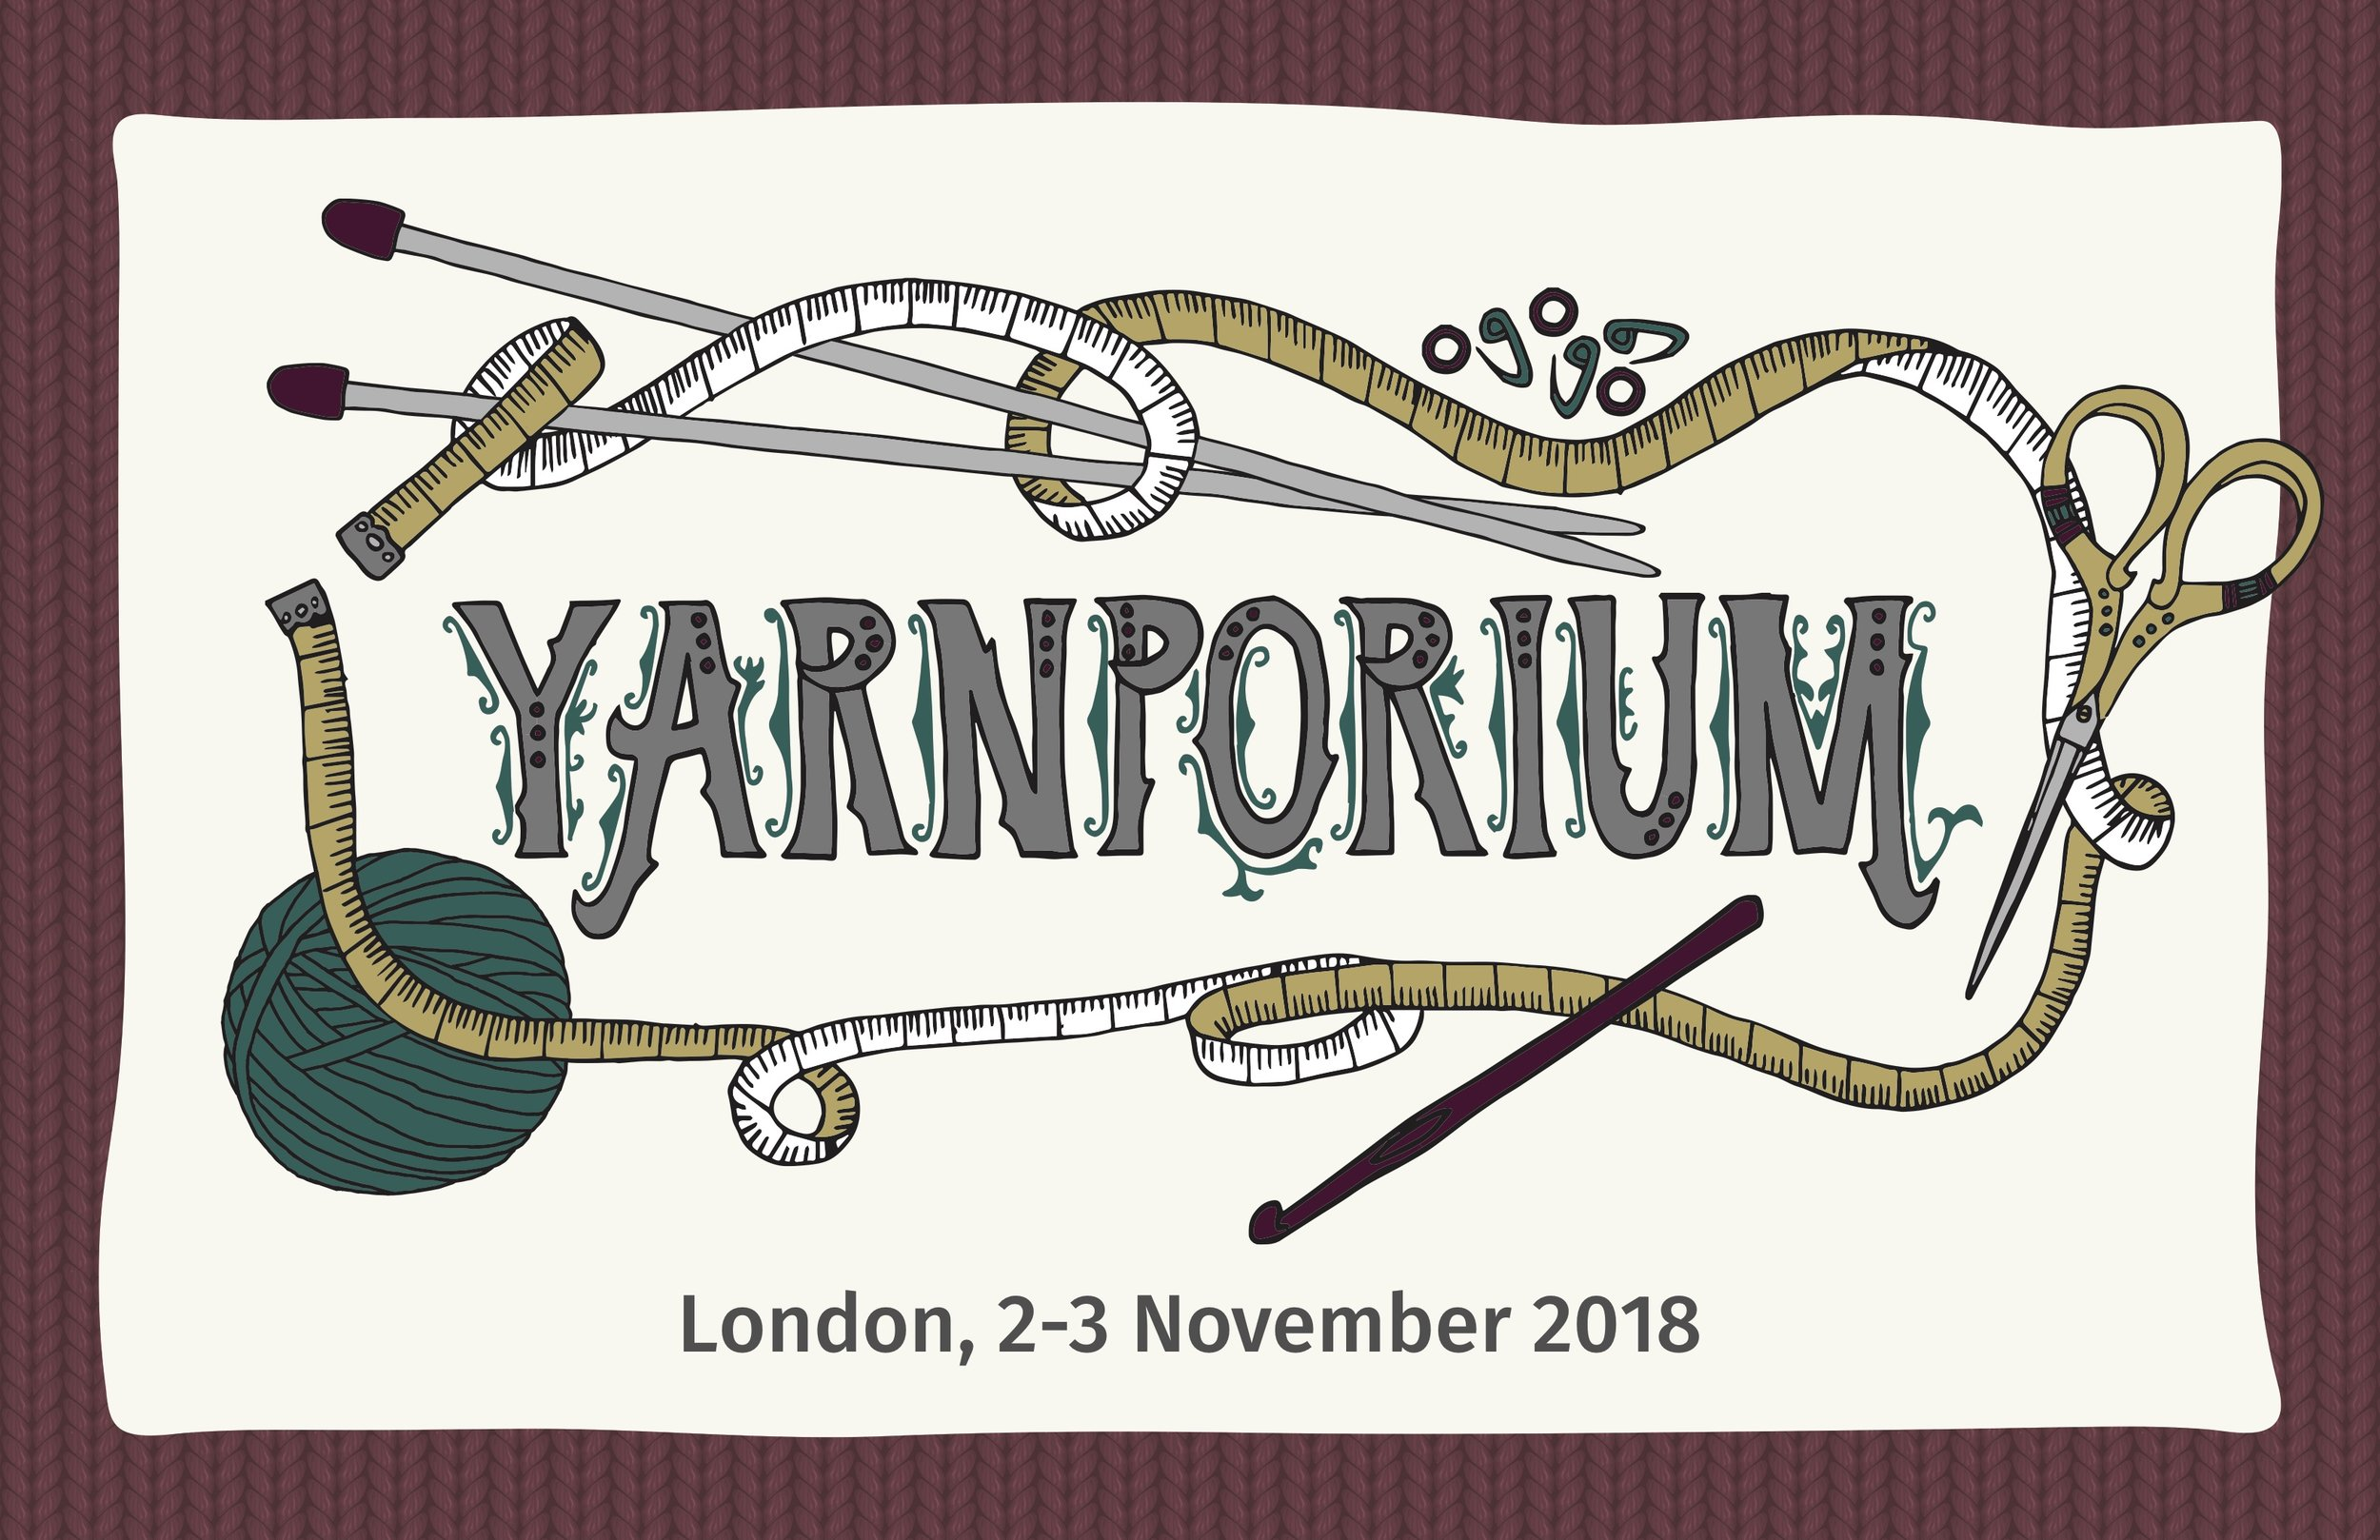 Yarnporium 2018 logo with background AW.jpg